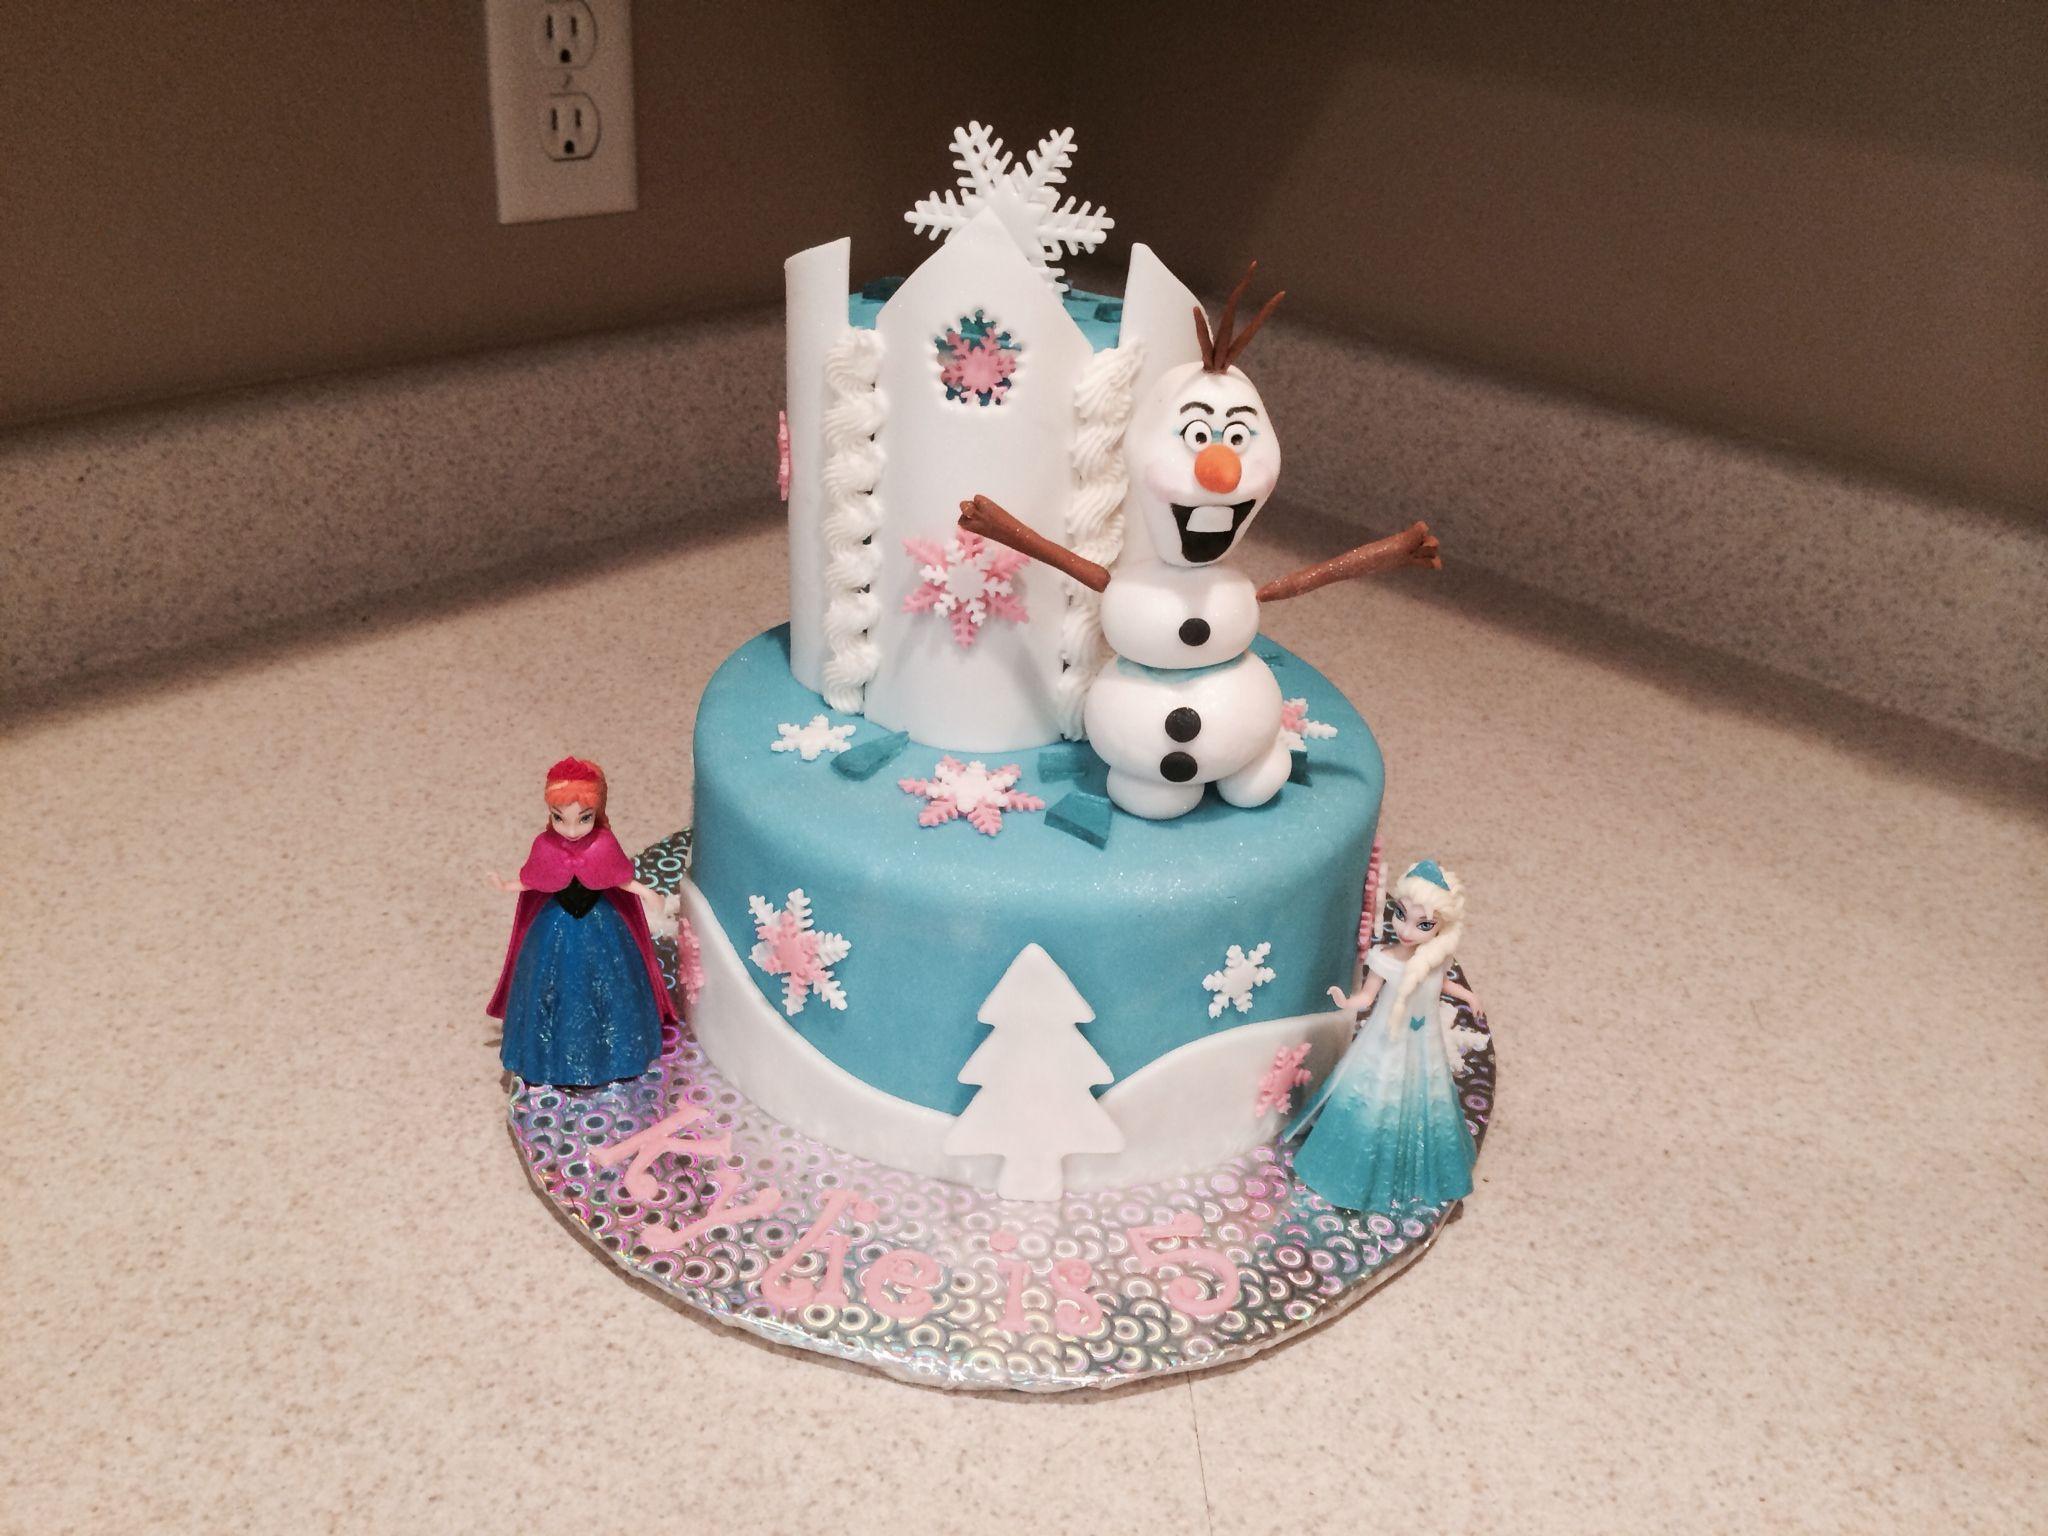 Cake Decoration Ideas Pinterest : Frozen!! Cake decorating ideas Pinterest